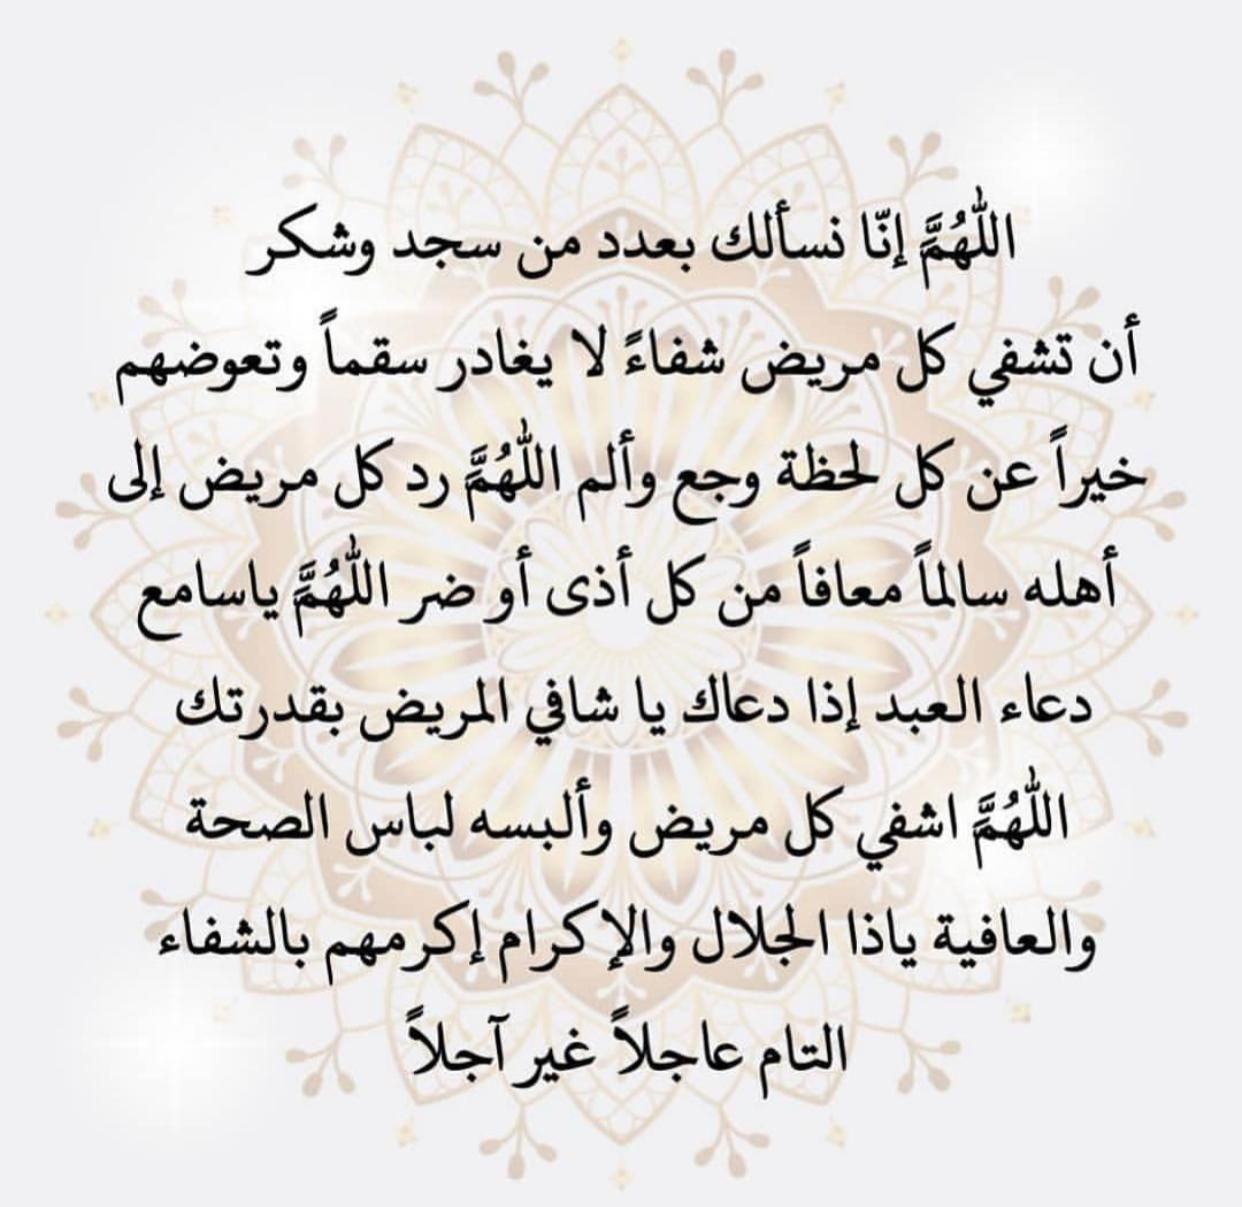 Pin By Kawaii On Prayers Prayers Arabic Calligraphy Calligraphy